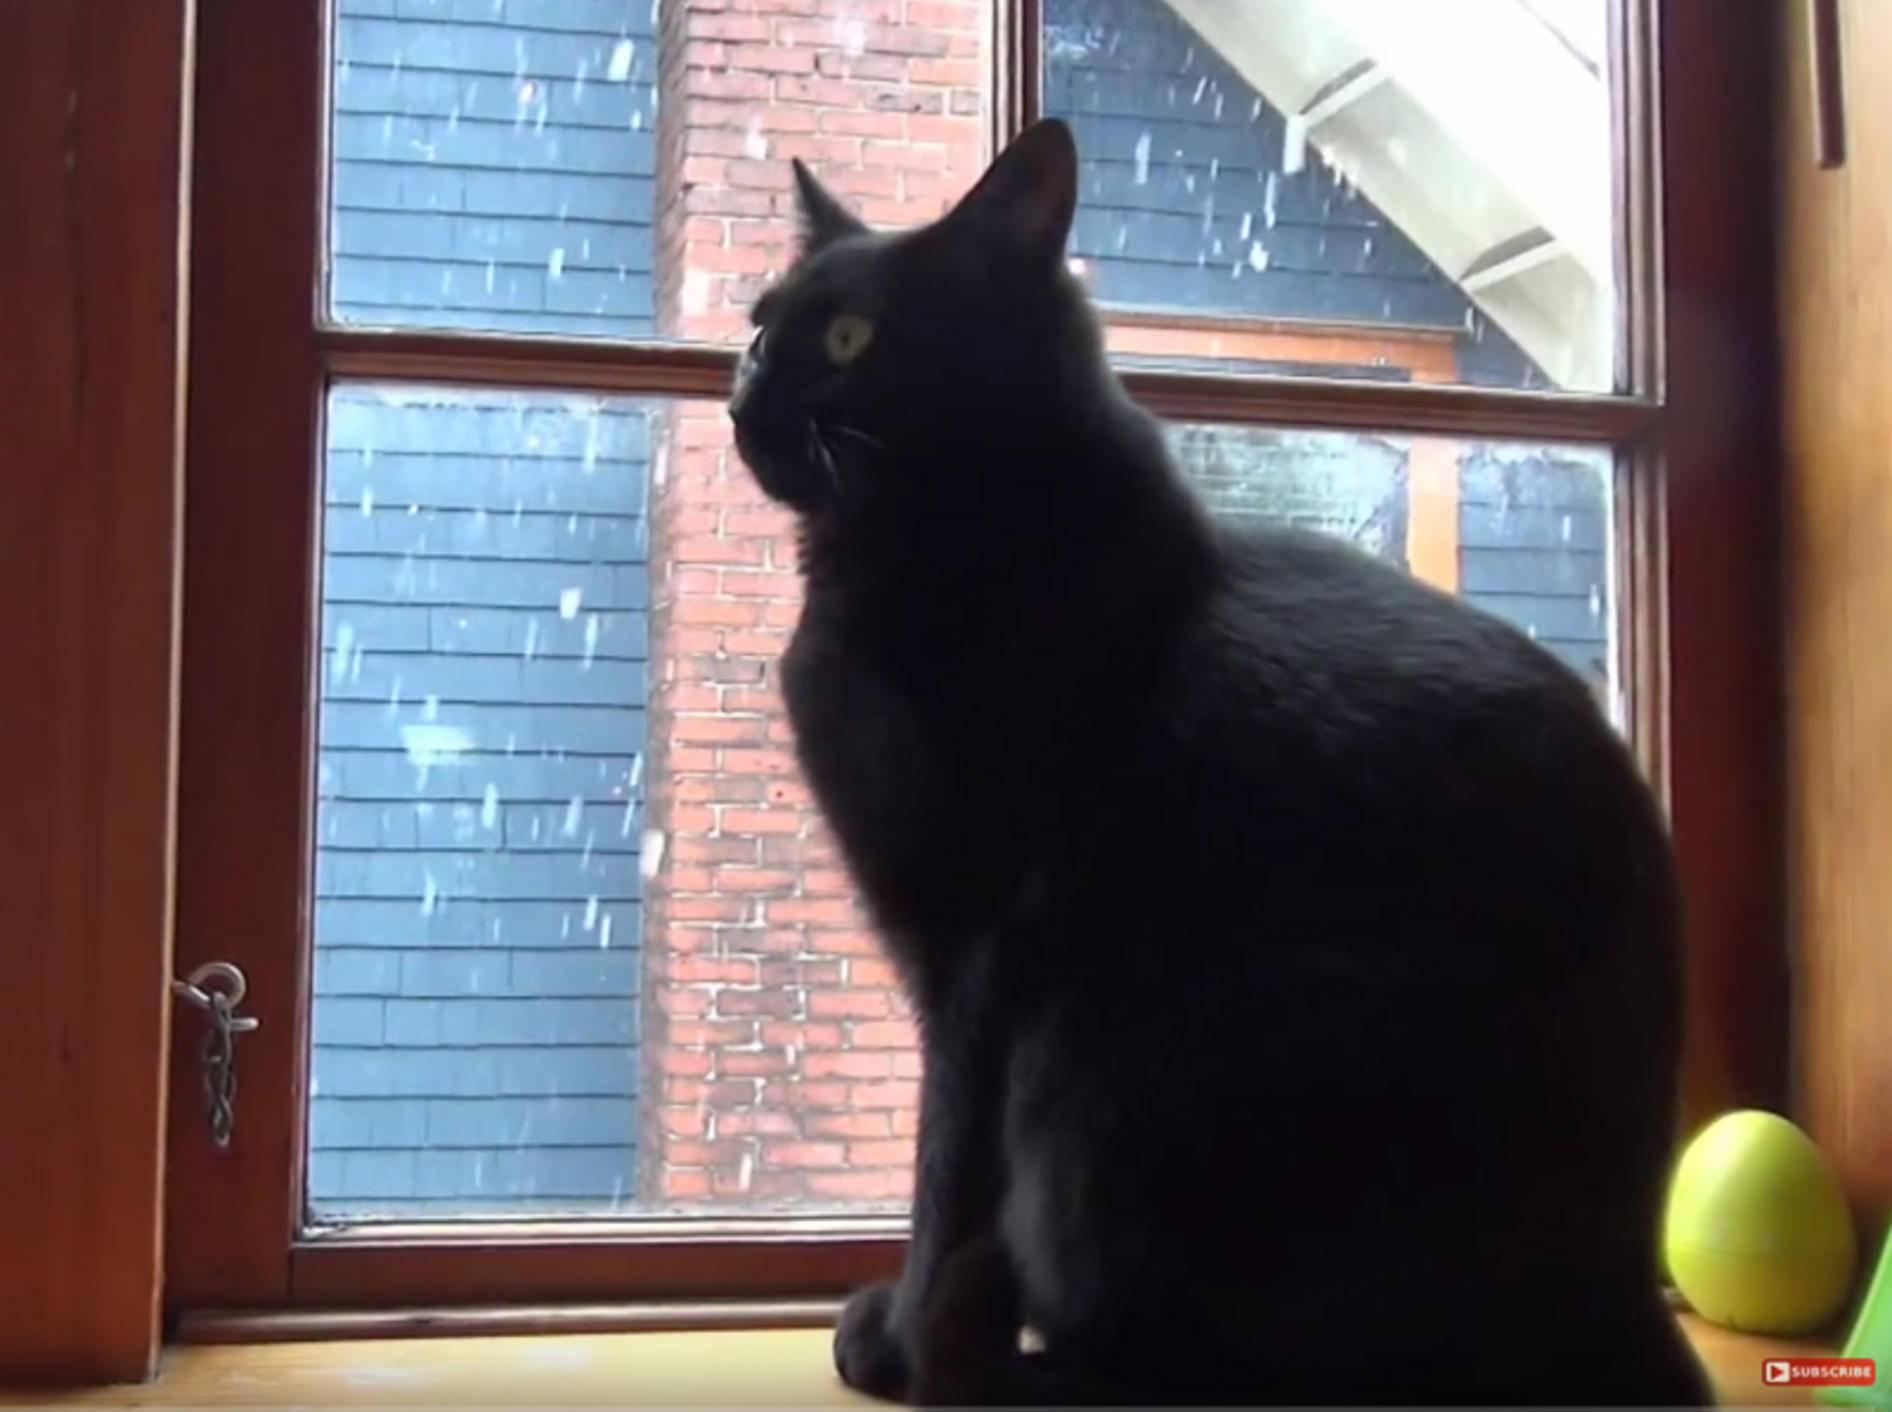 Cupcake, Roodi, Kami und Co.: Katzen feiern Weihnachten – YouTube / The Kits Cats